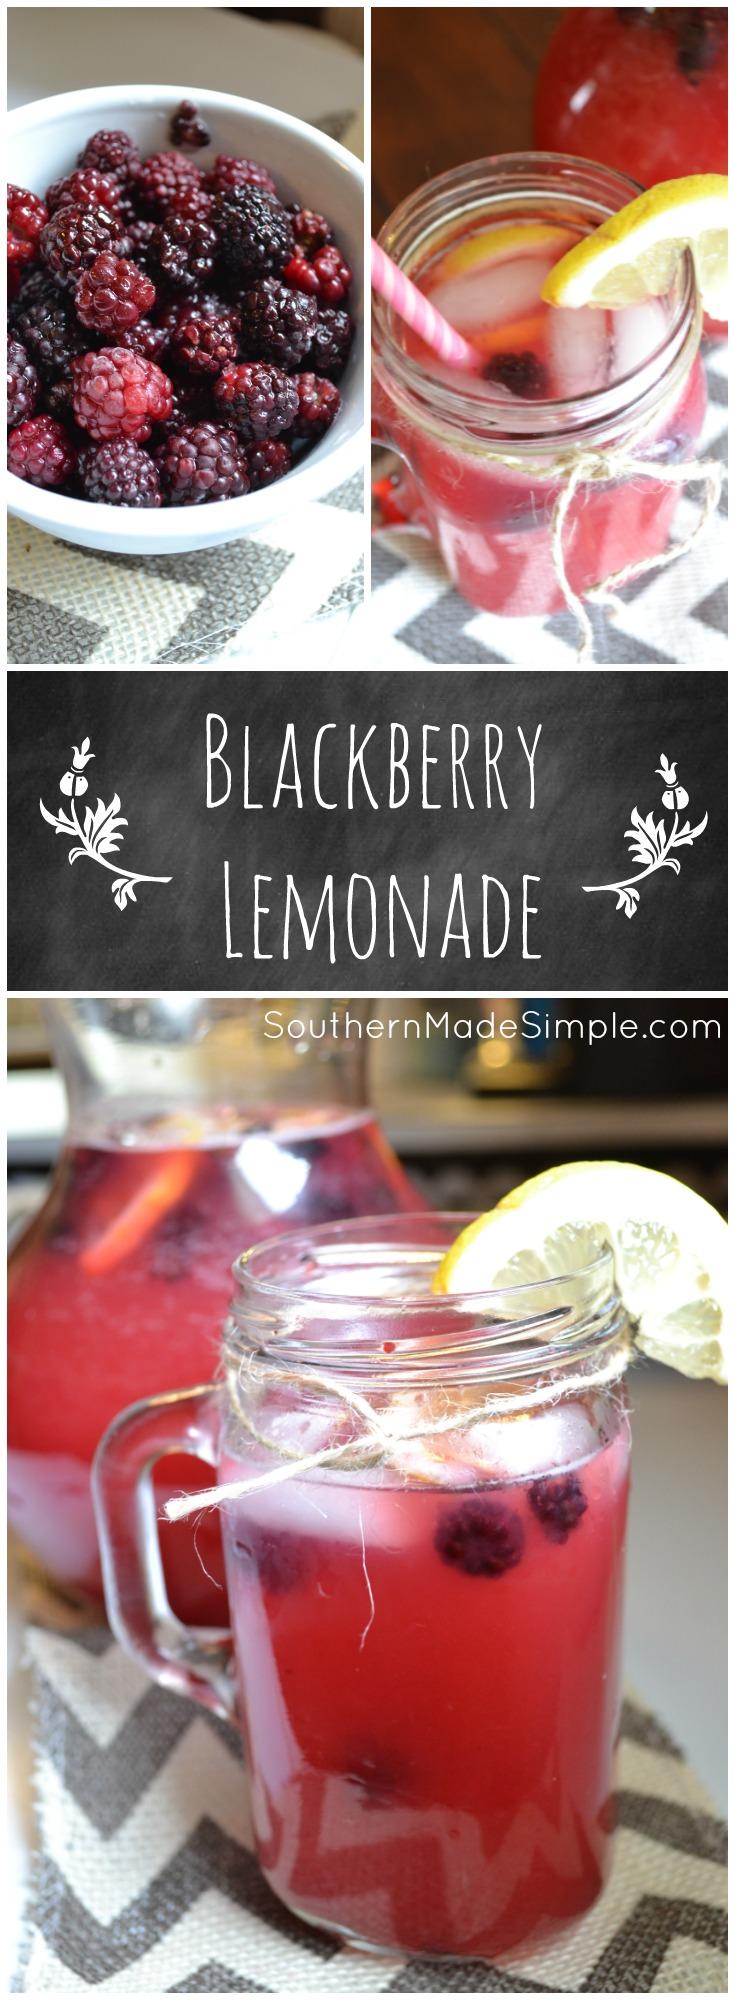 Refreshing Blackberry Lemonade - A PERFECT summertime treat!